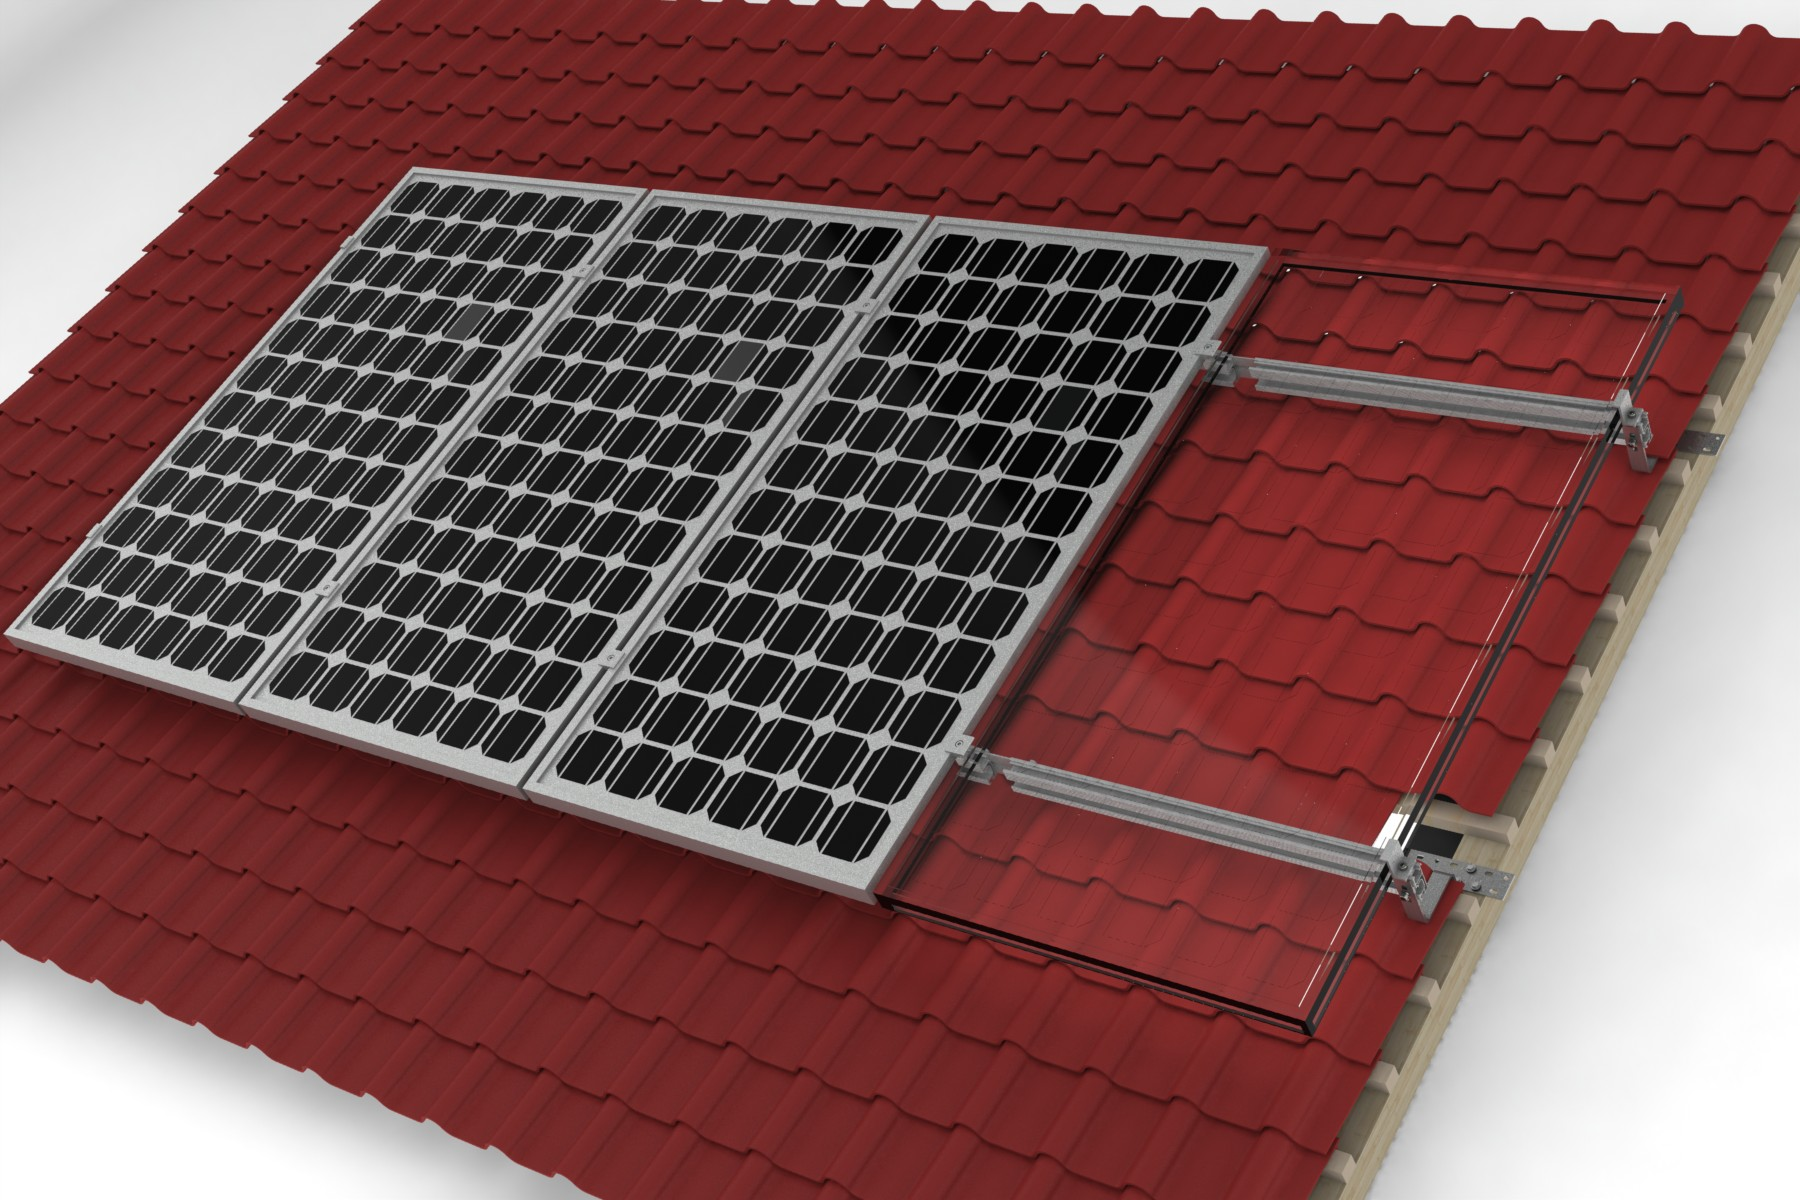 Chiko Tile Roof System Manufacturer Of Professional Solar